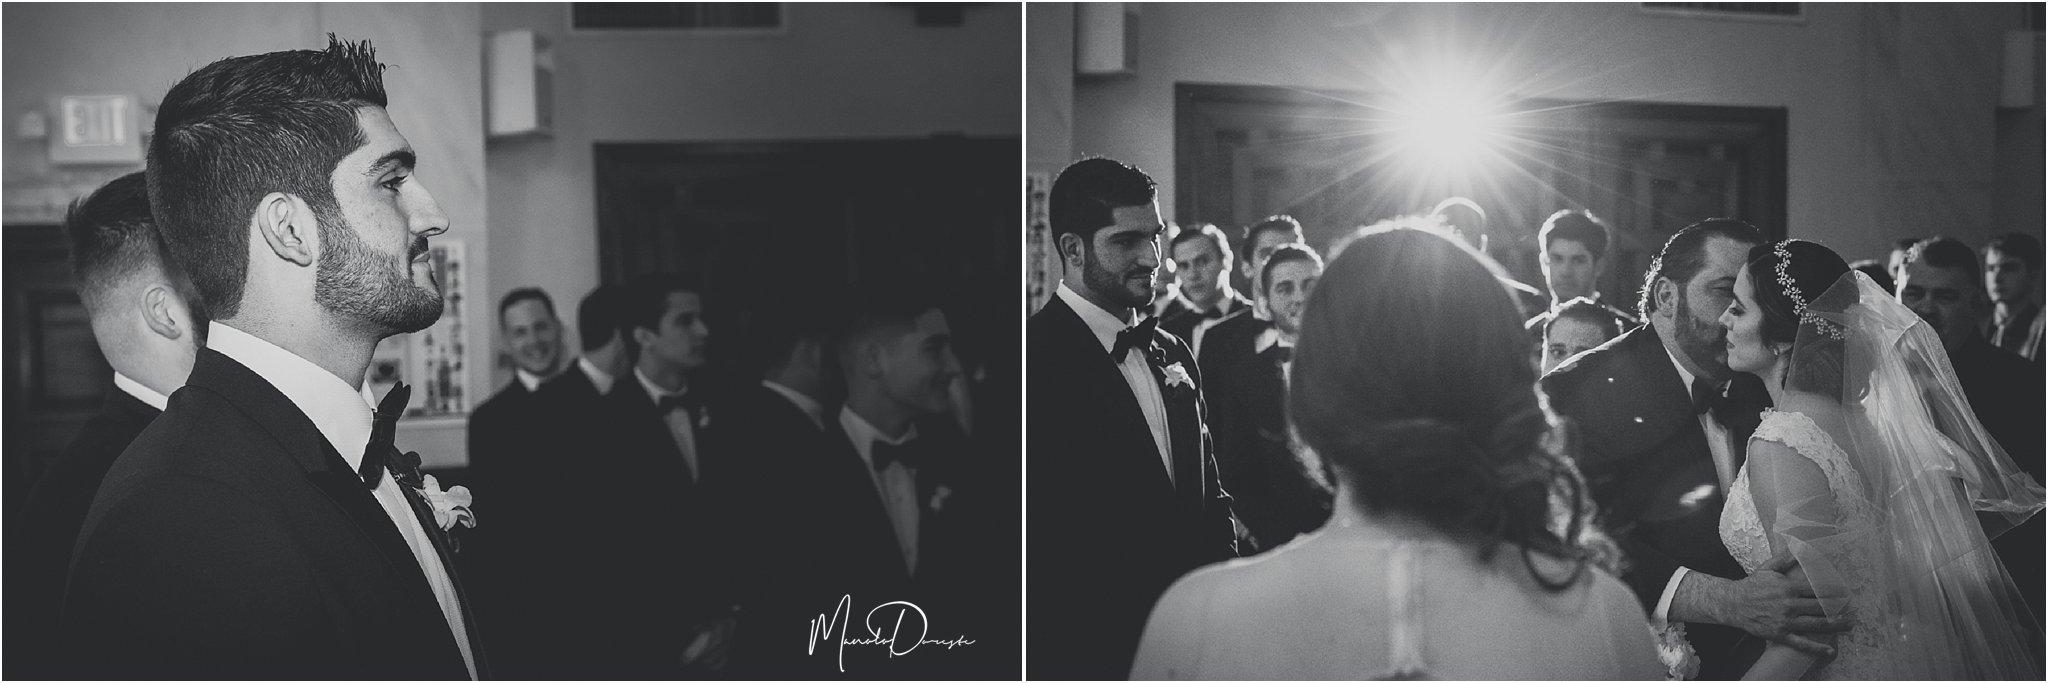 00937_ManoloDoreste_InFocusStudios_Wedding_Family_Photography_Miami_MiamiPhotographer.jpg